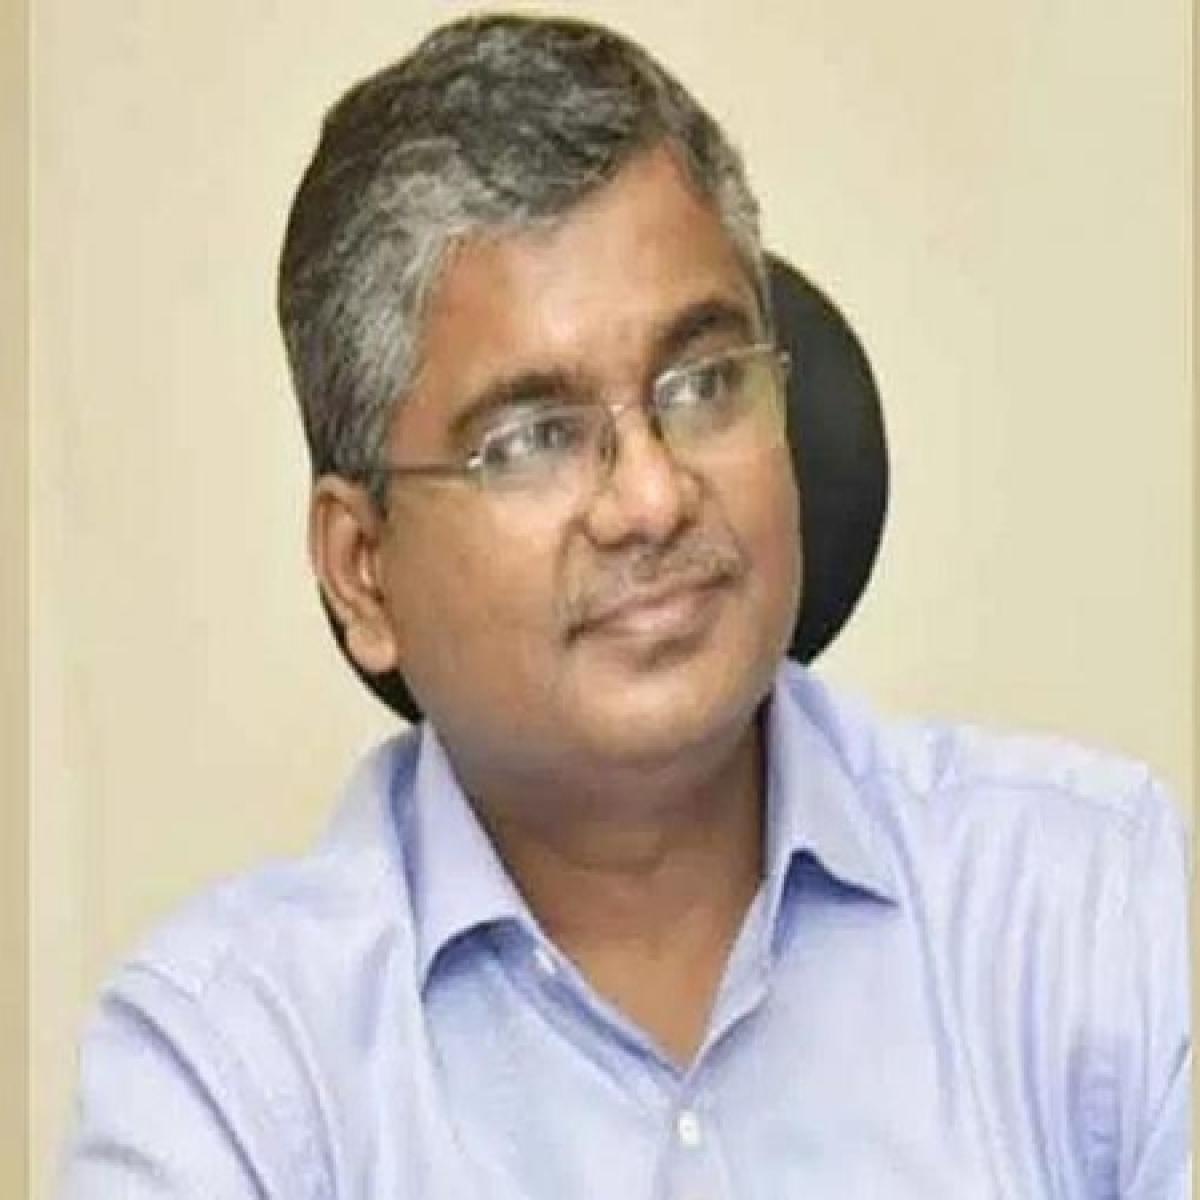 Bureaucratic reshuffle: Vikas Kharge is appointed CM's principal secretary